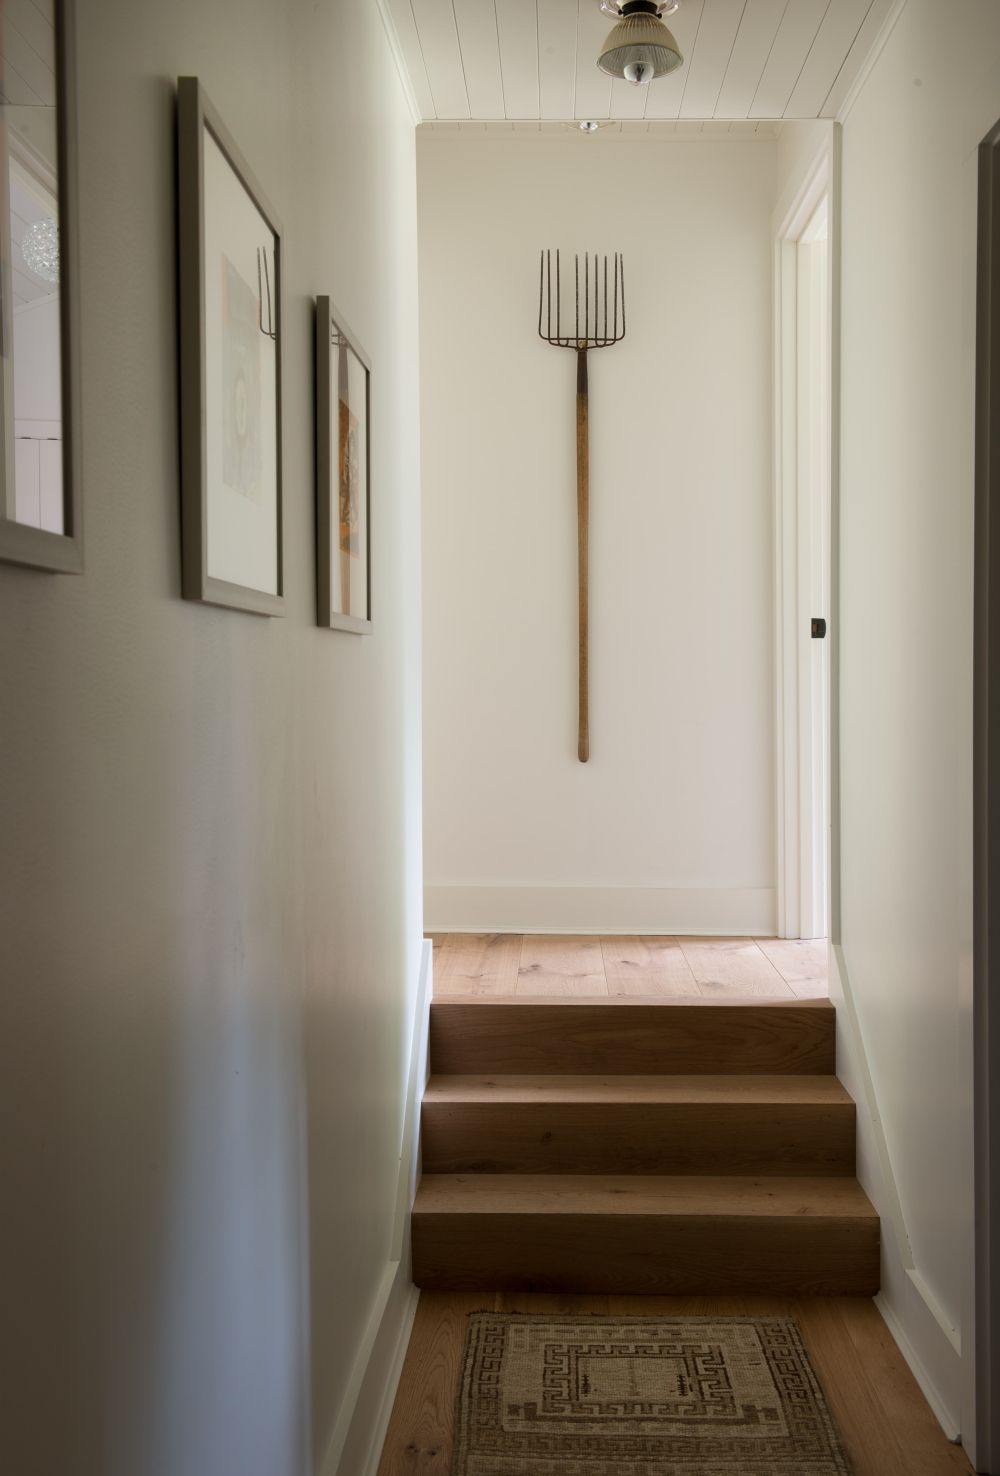 adelaparvu.com despre casa din lemn cu interior rustic actual, Design Kelly Mittleman, arch Mark Finlay, Foto Jane Beiles (24)